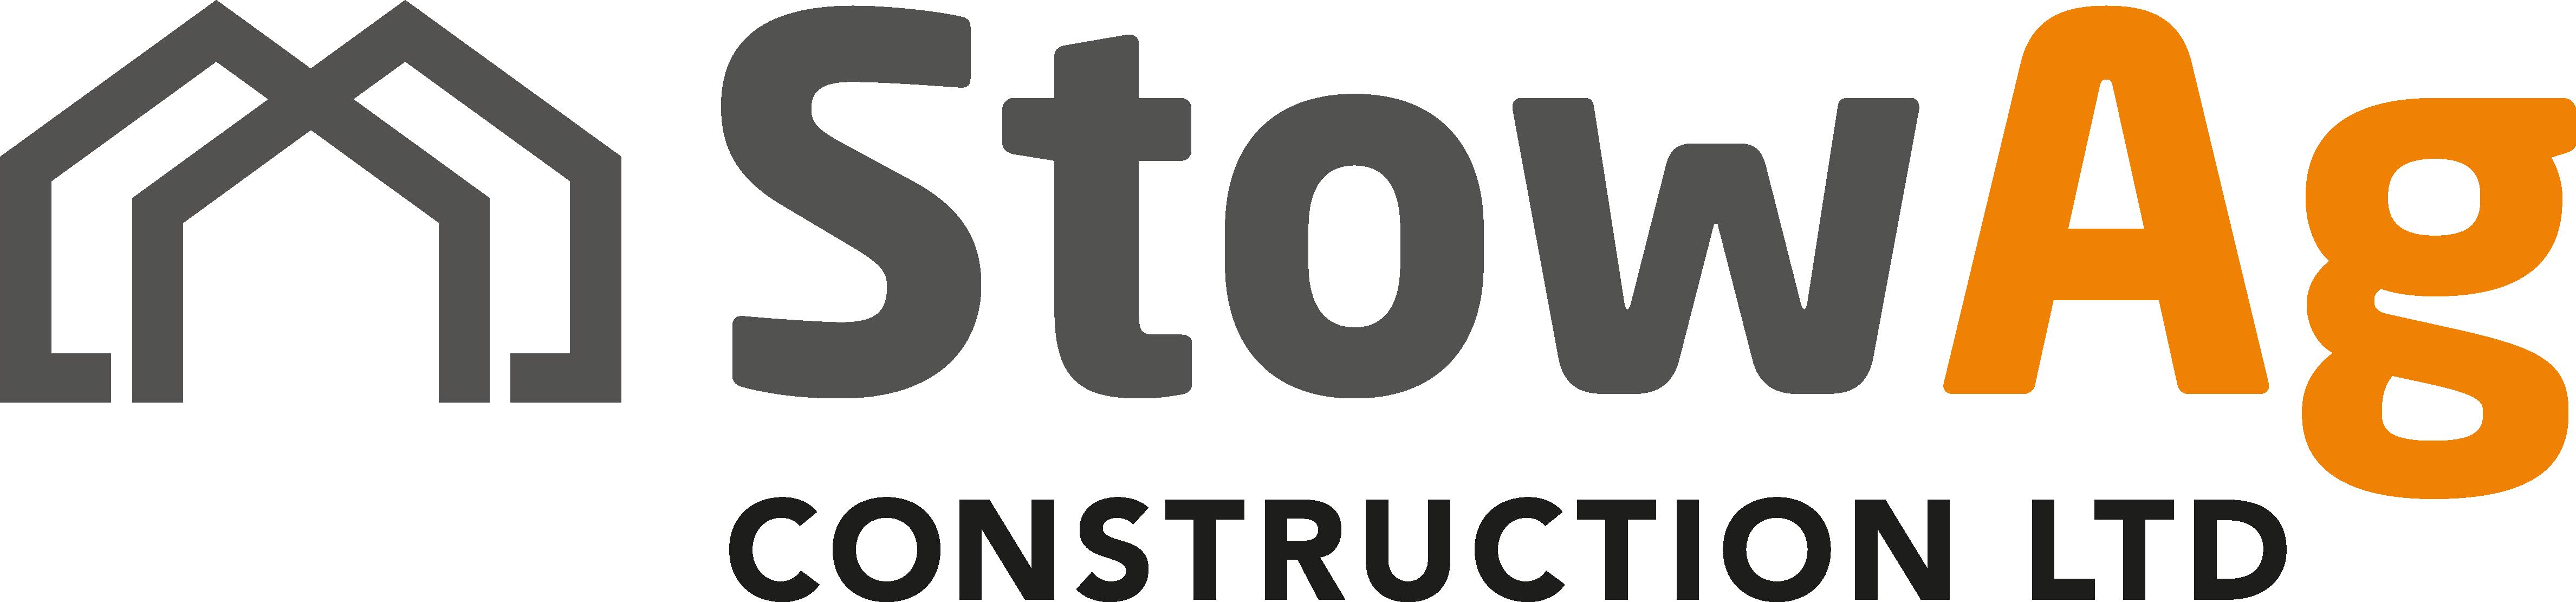 StowAG Construction Ltd